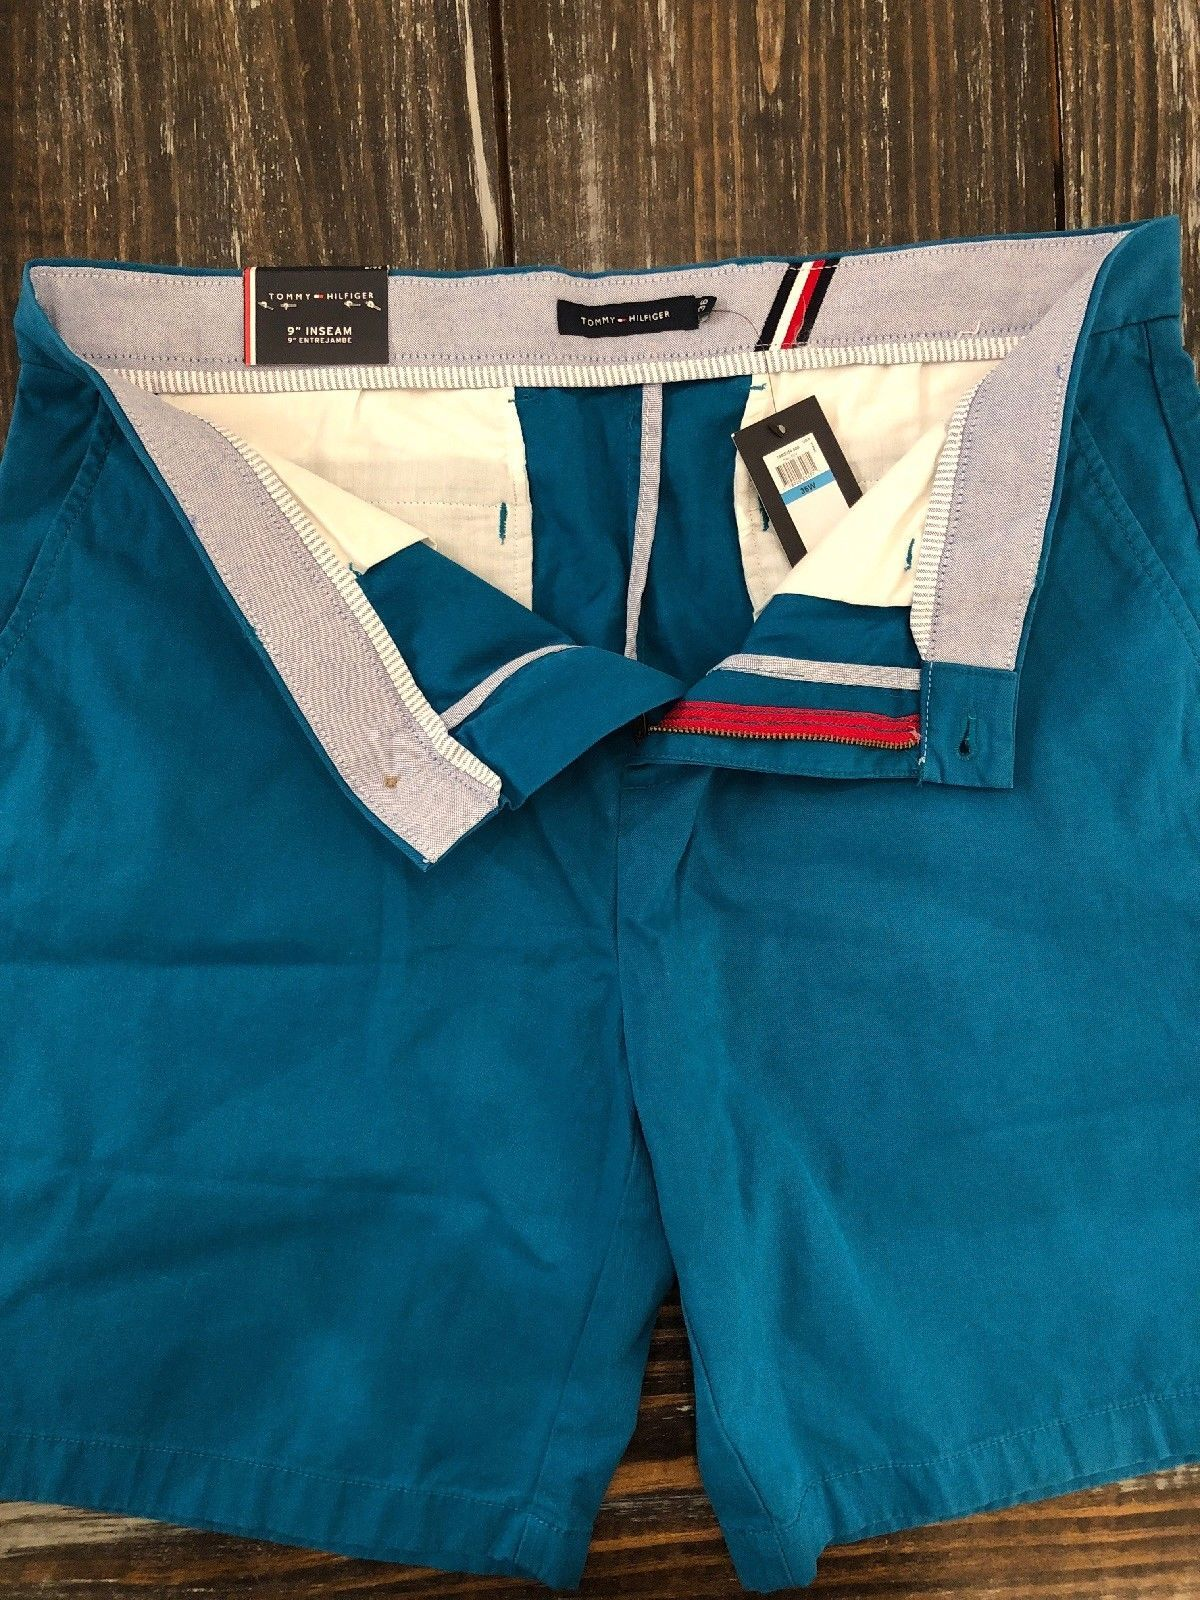 "Tommy Hilfiger 9 Inch Shorts ""Ocean Depths"" Aqua Green Mens Size 36 Brand NEW!!!"